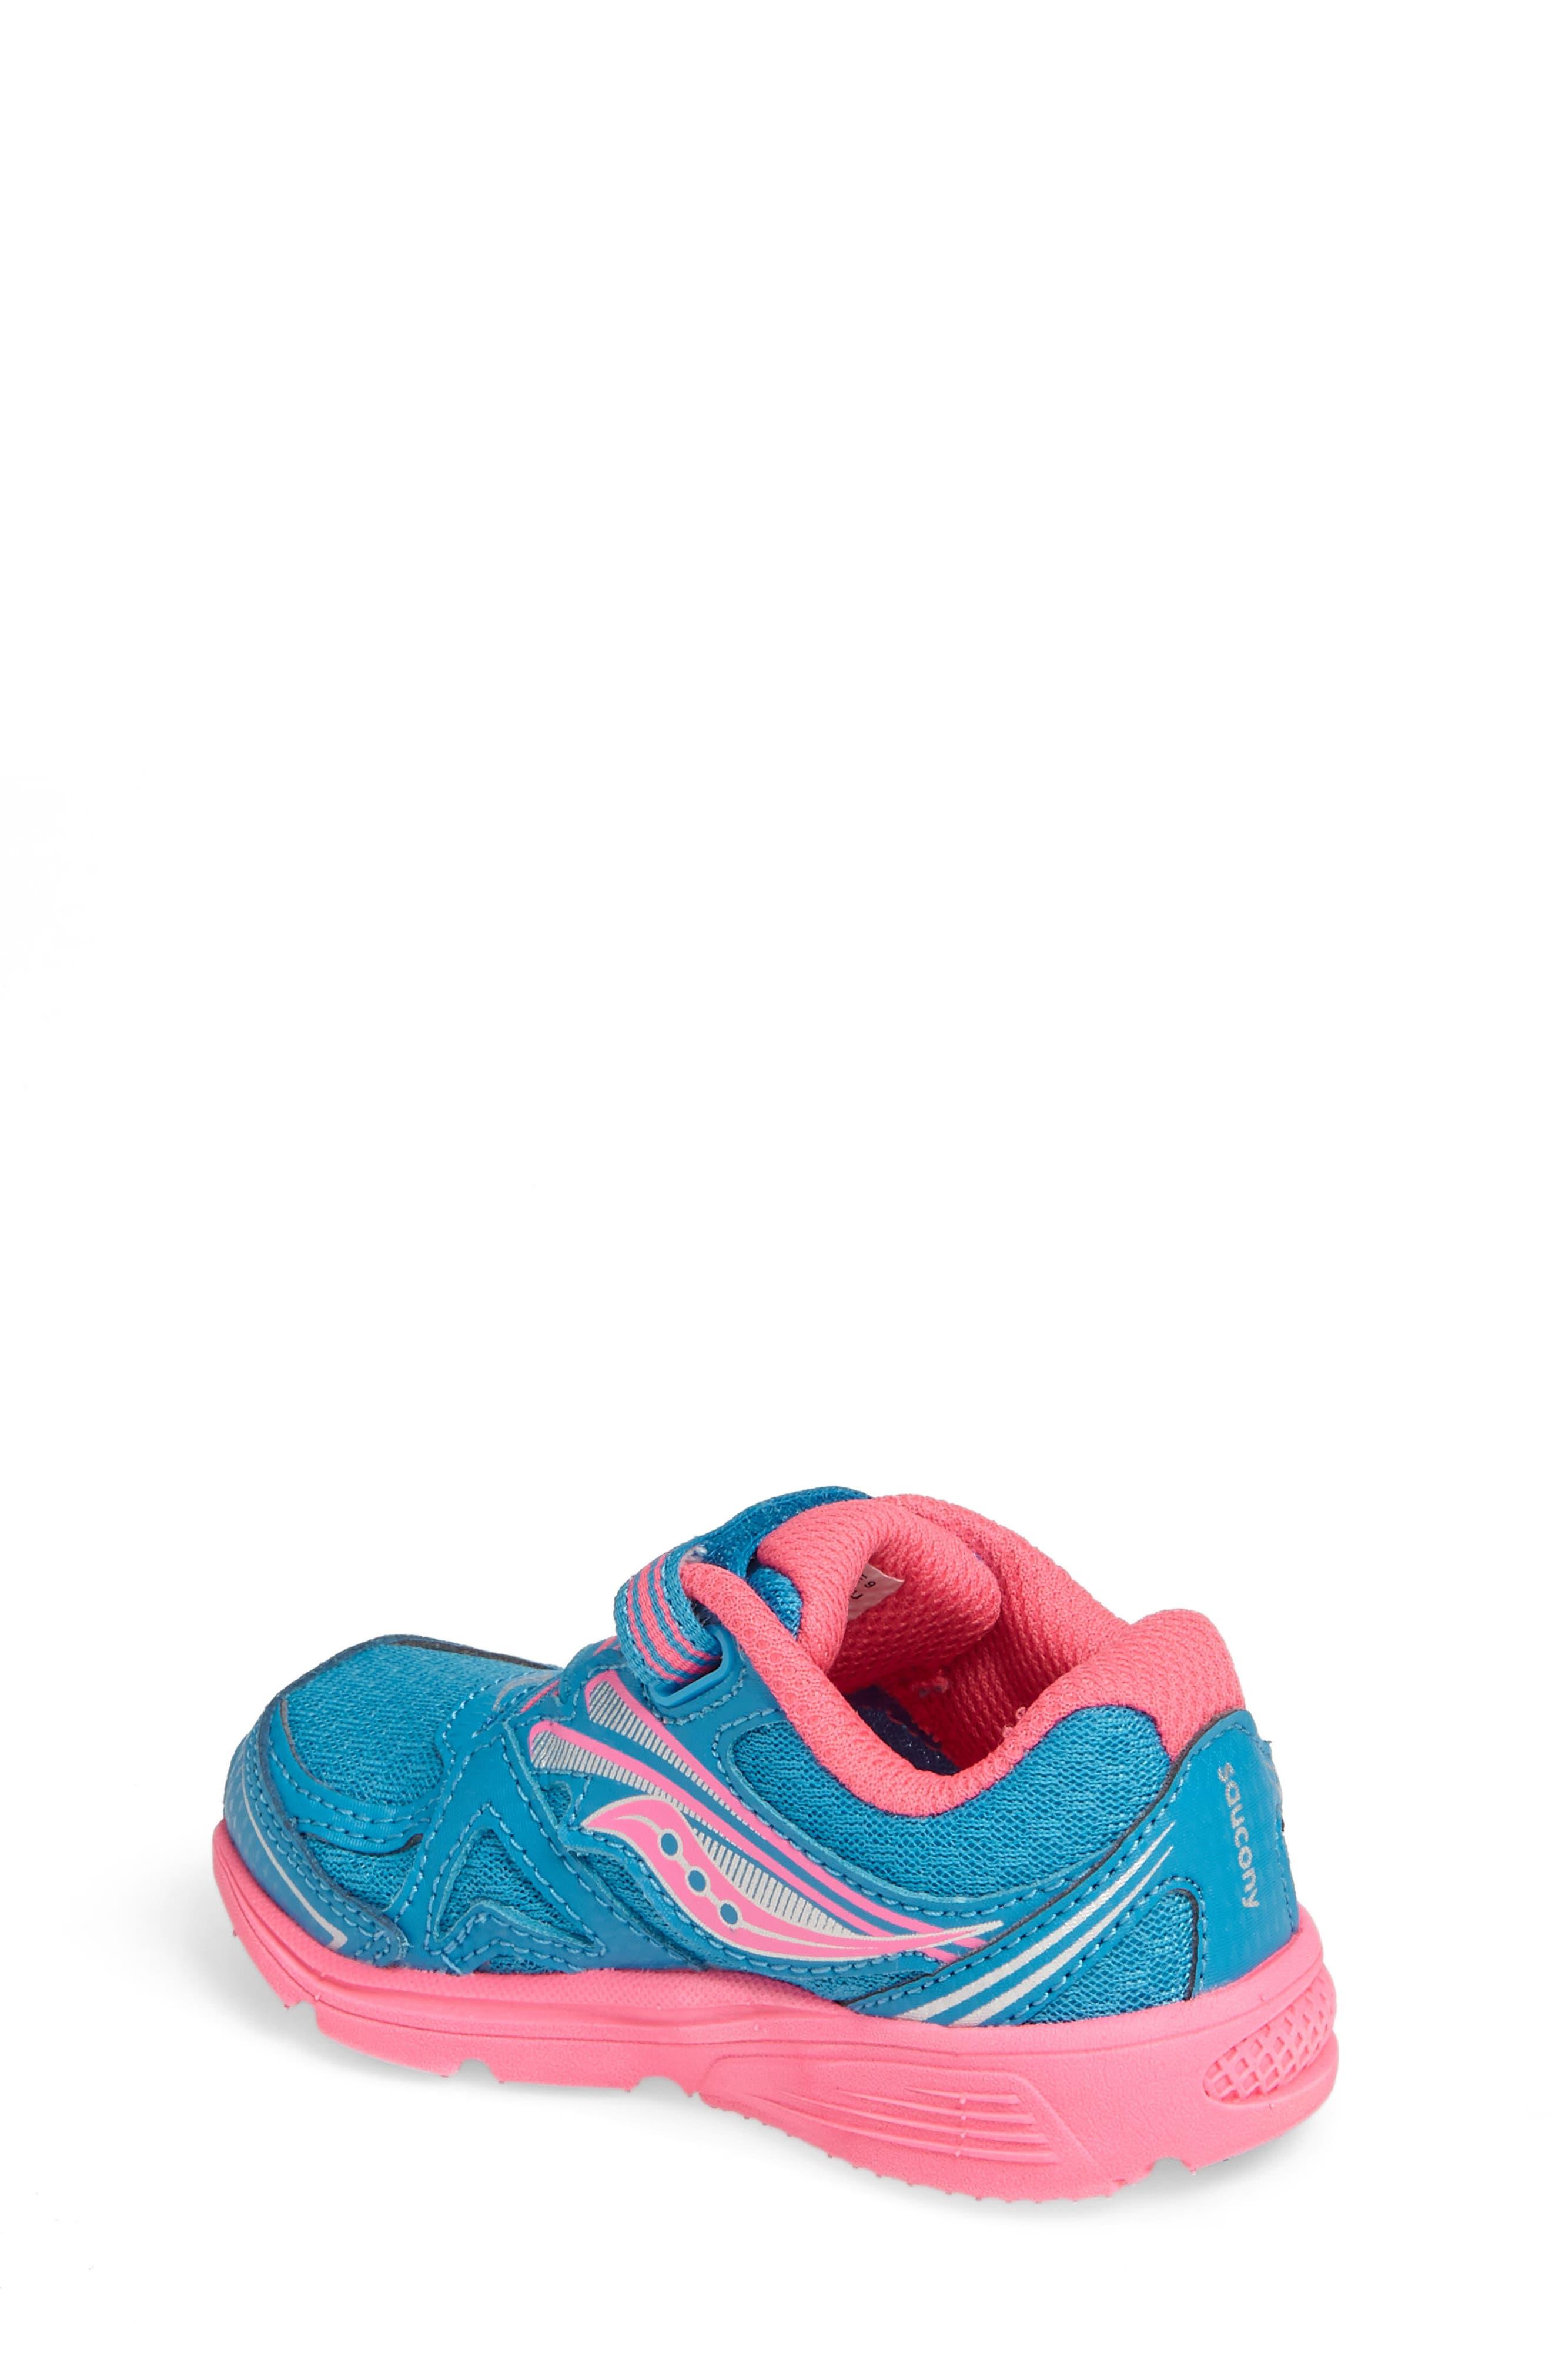 'Baby Ride' Sneaker,                             Alternate thumbnail 2, color,                             401